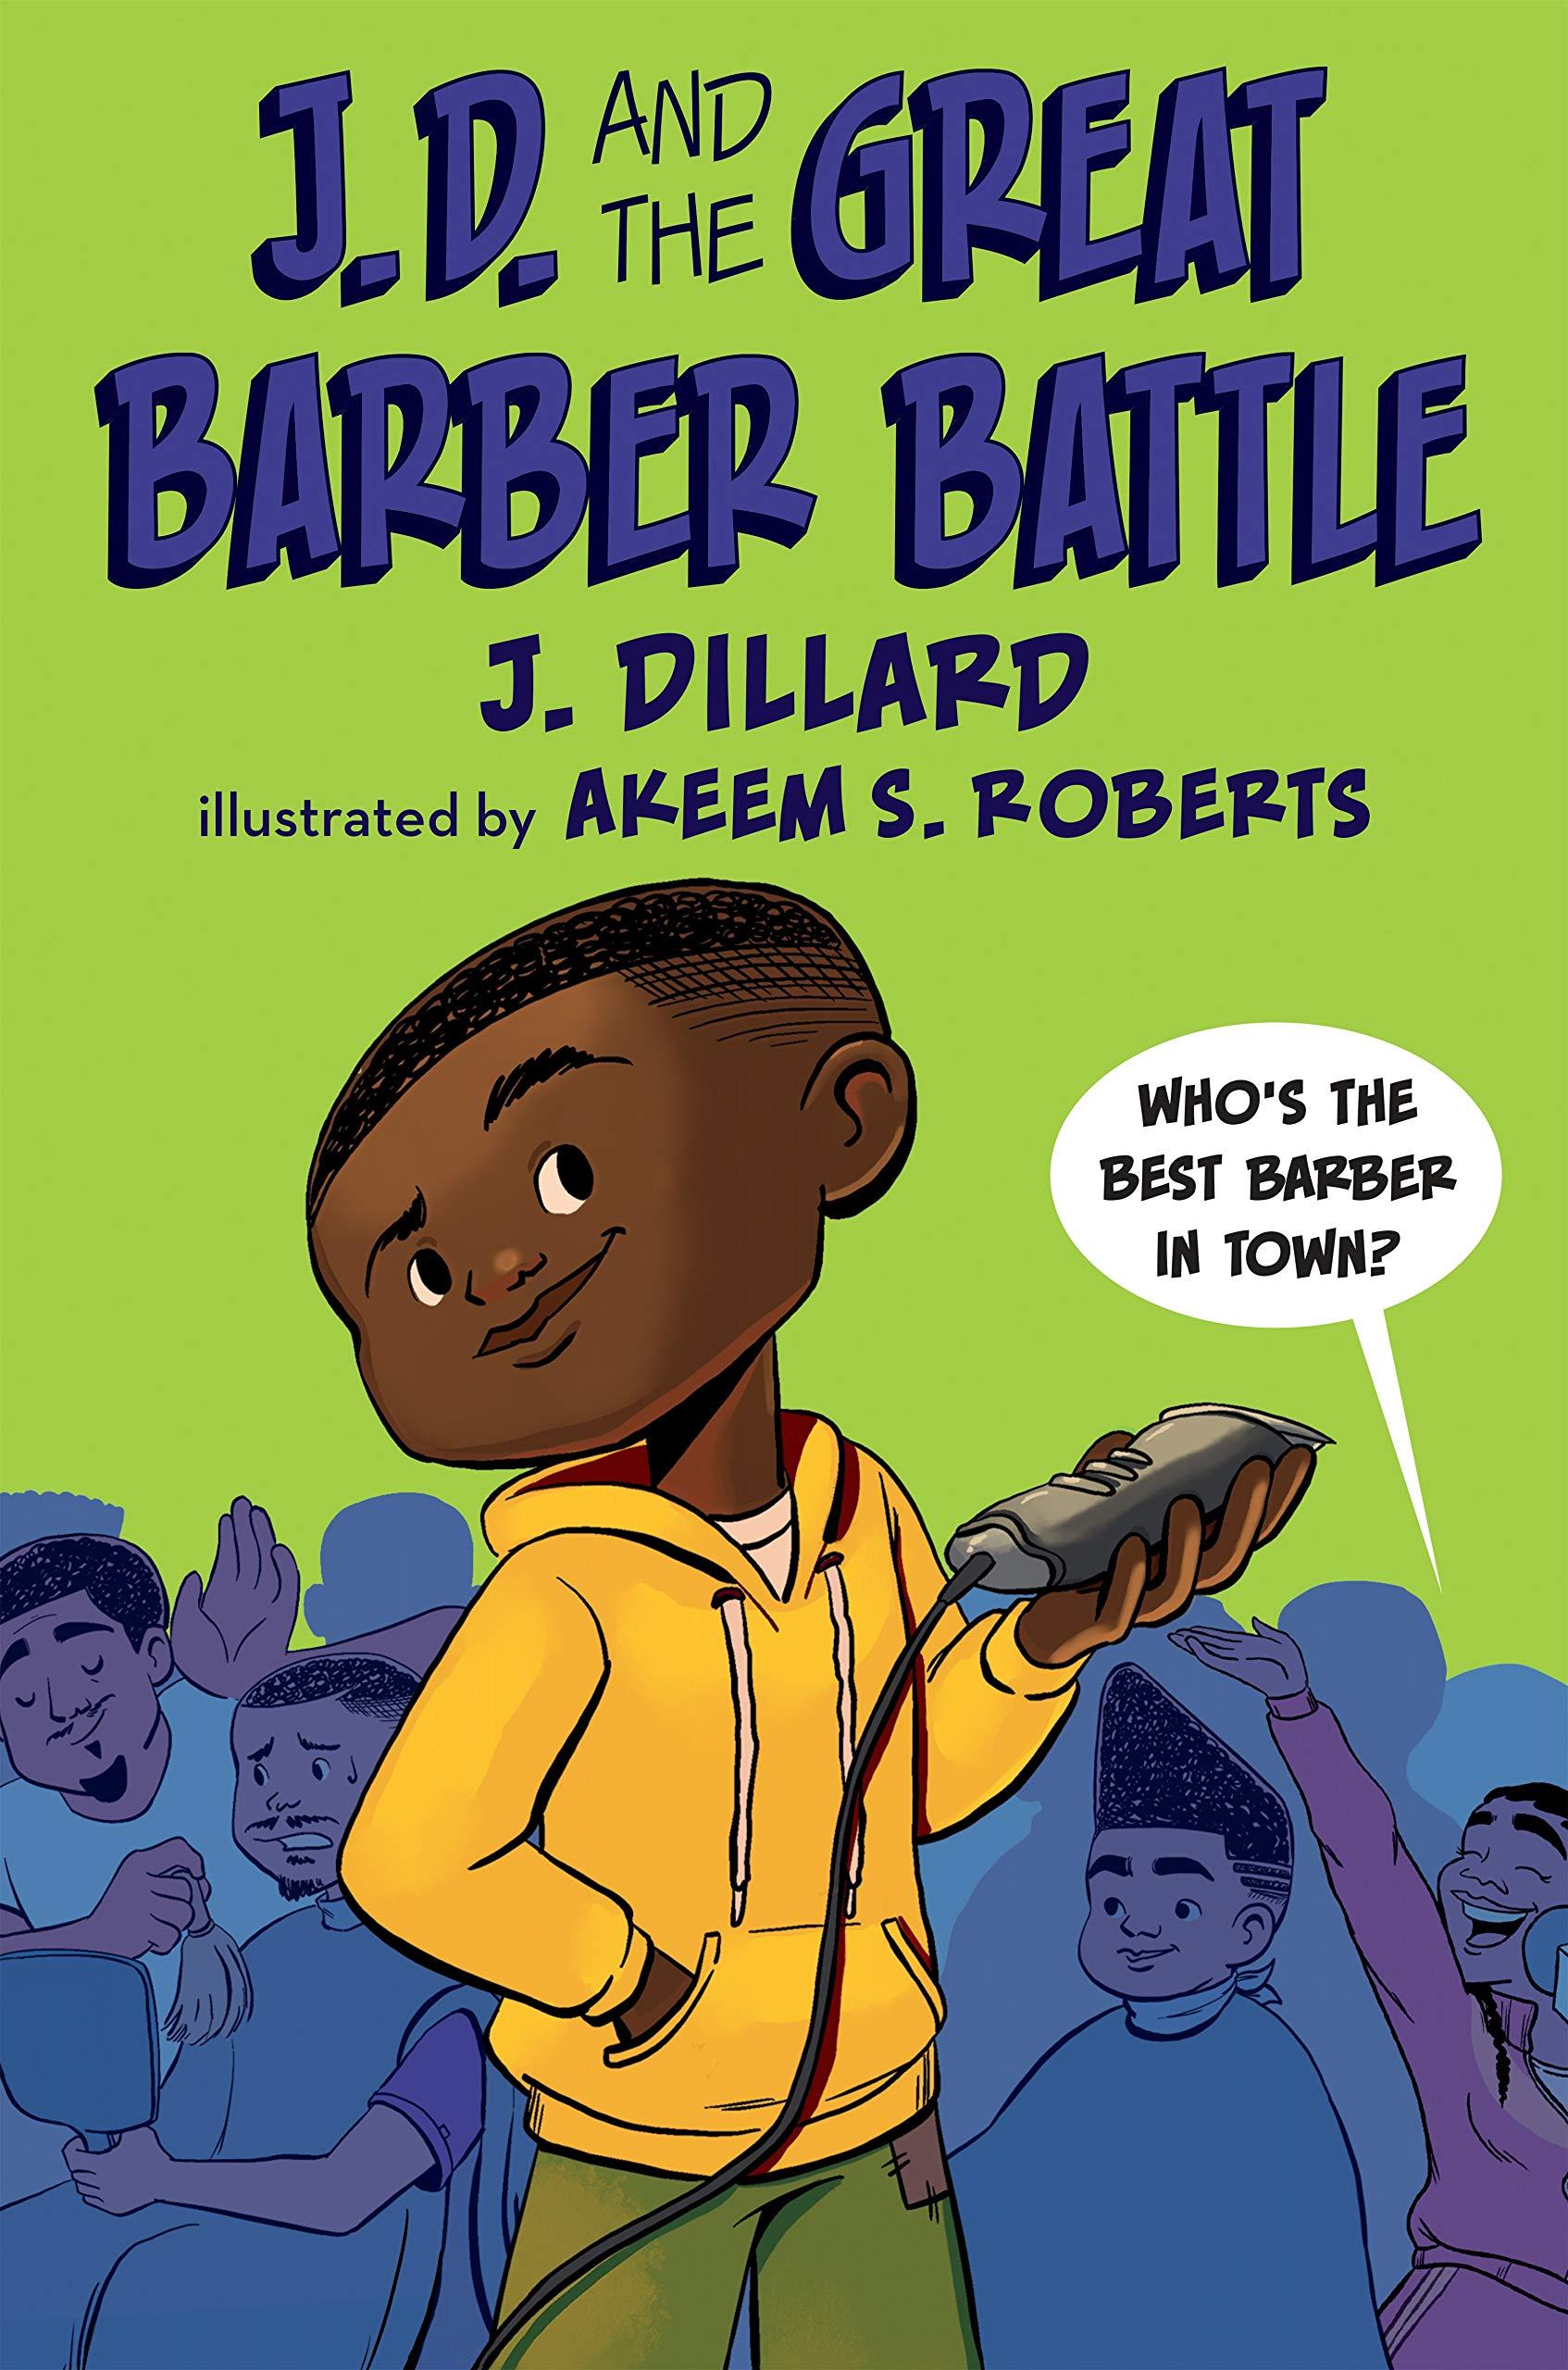 Amazon.com: J.D. and the Great Barber Battle (9780593111529): Dillard, J.,  Roberts, Akeem S.: Books